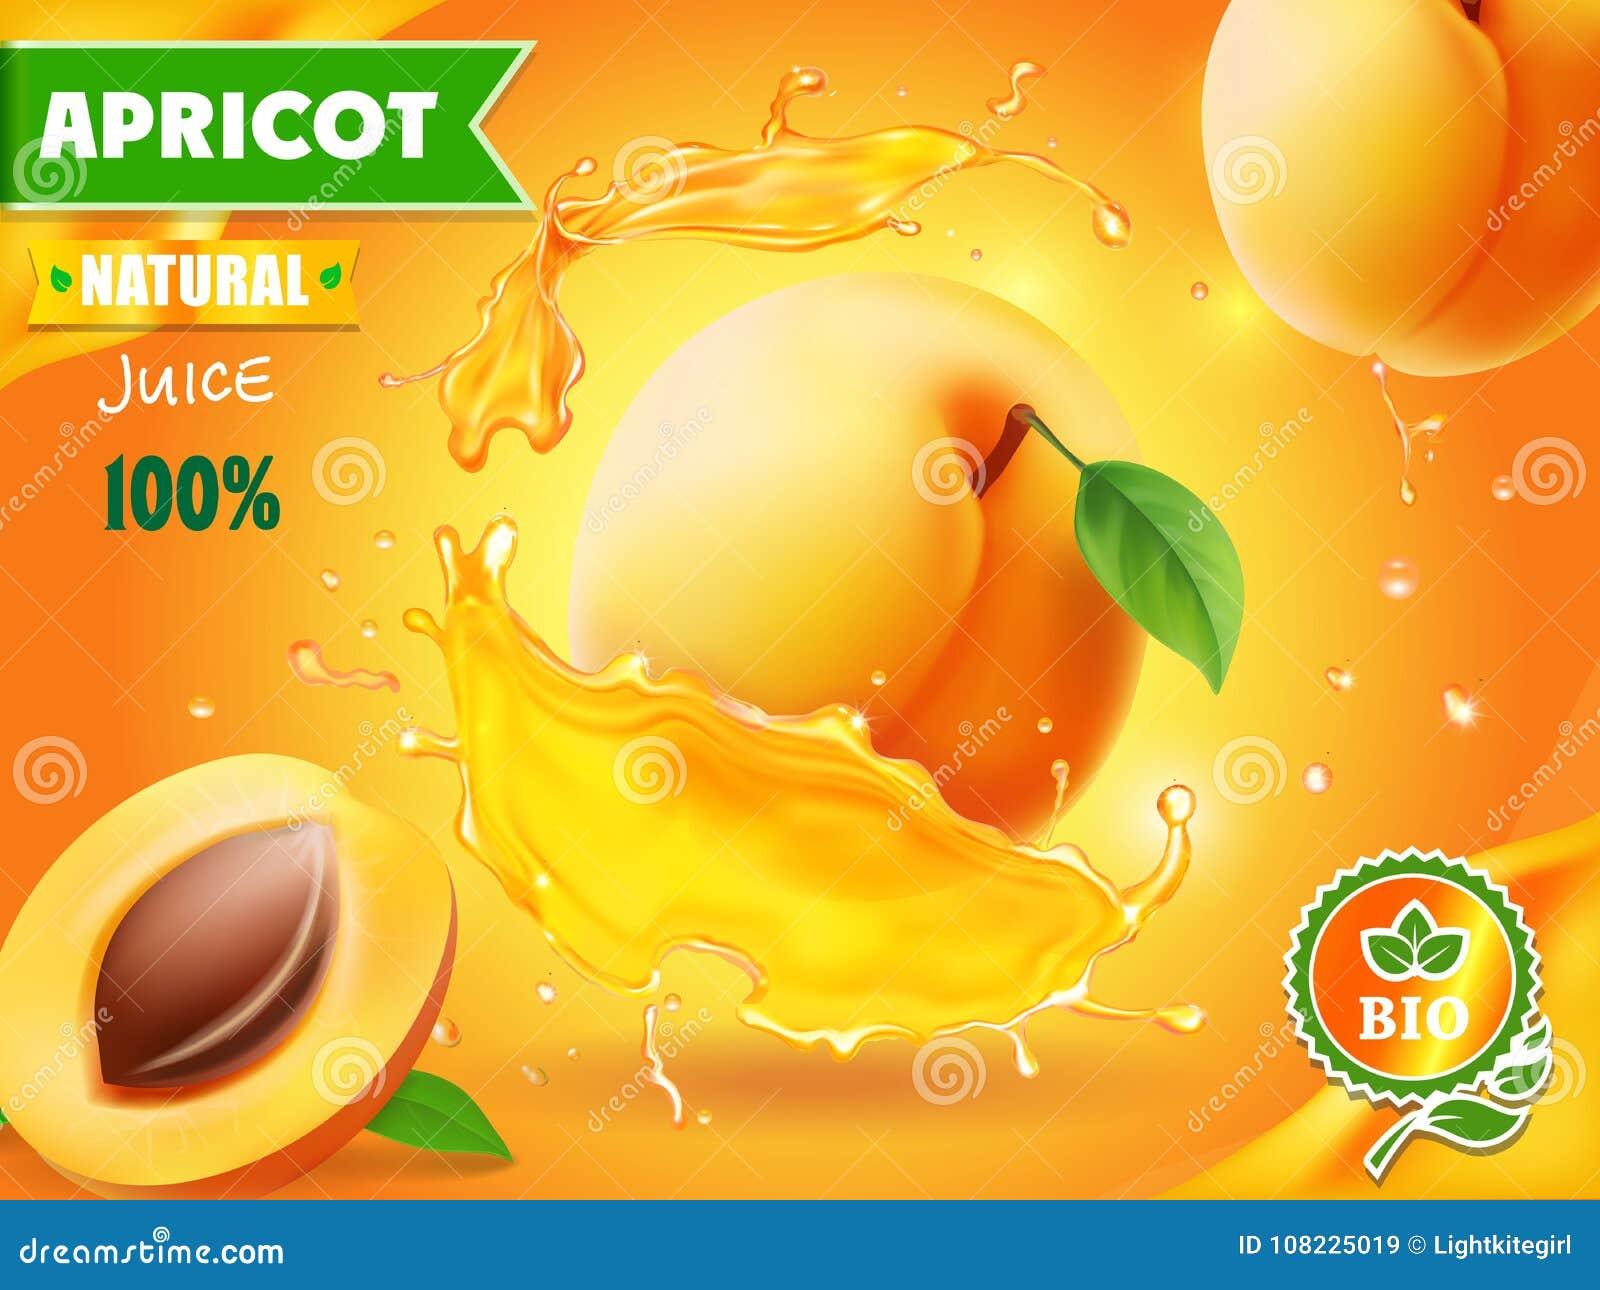 Apricot Fruit In Juice Splash Advertising Poster Stock ...